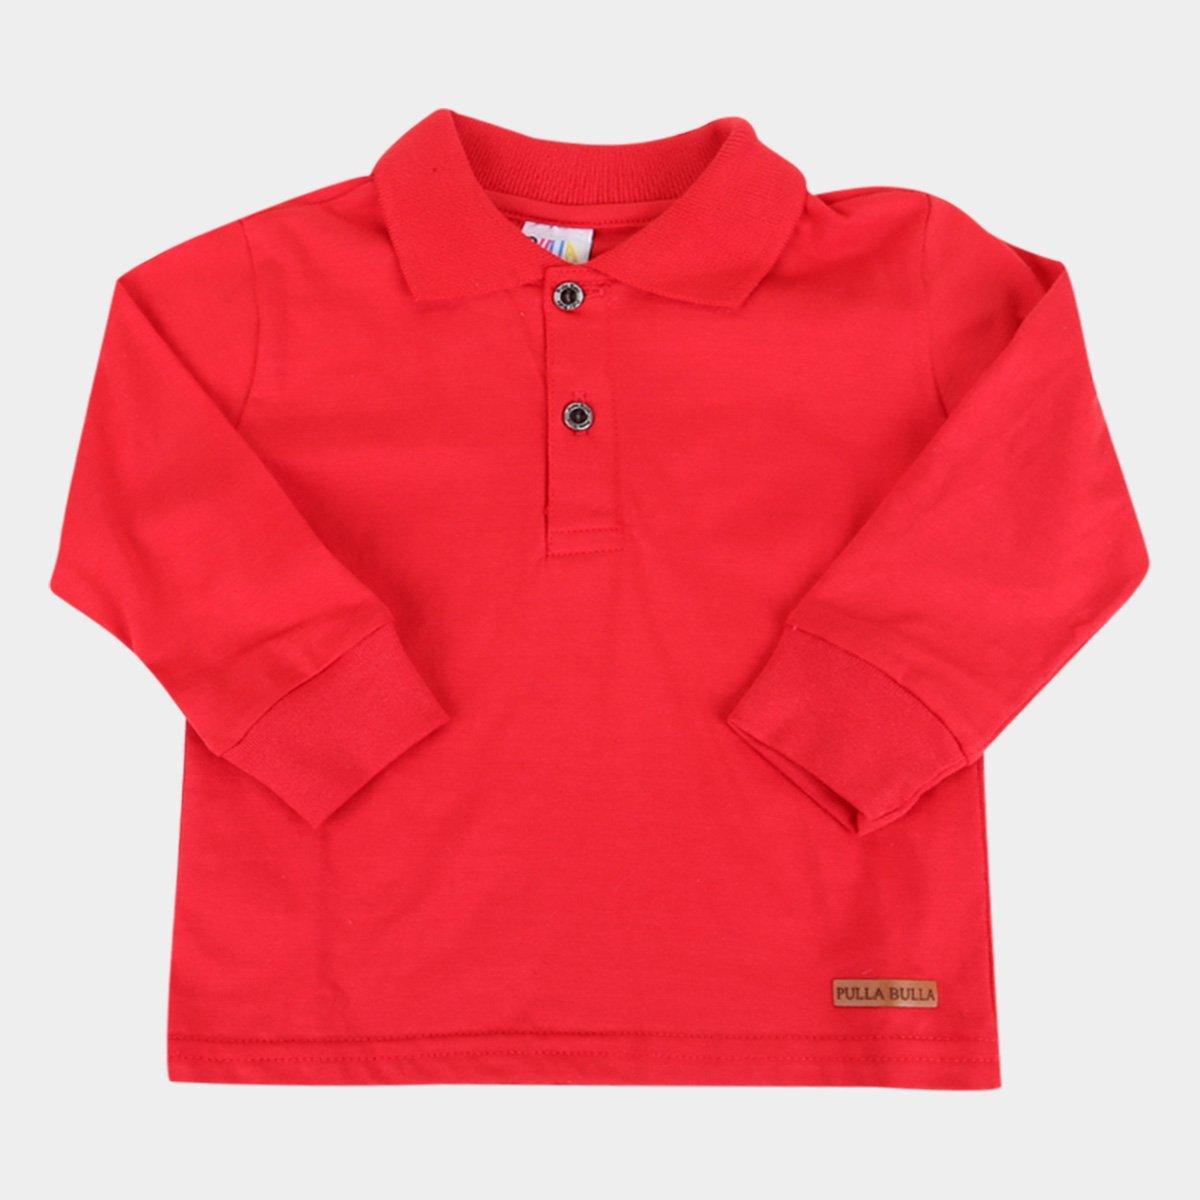 Camisa Polo Bebê Pulla Bulla Manga Longa Básica Masculina